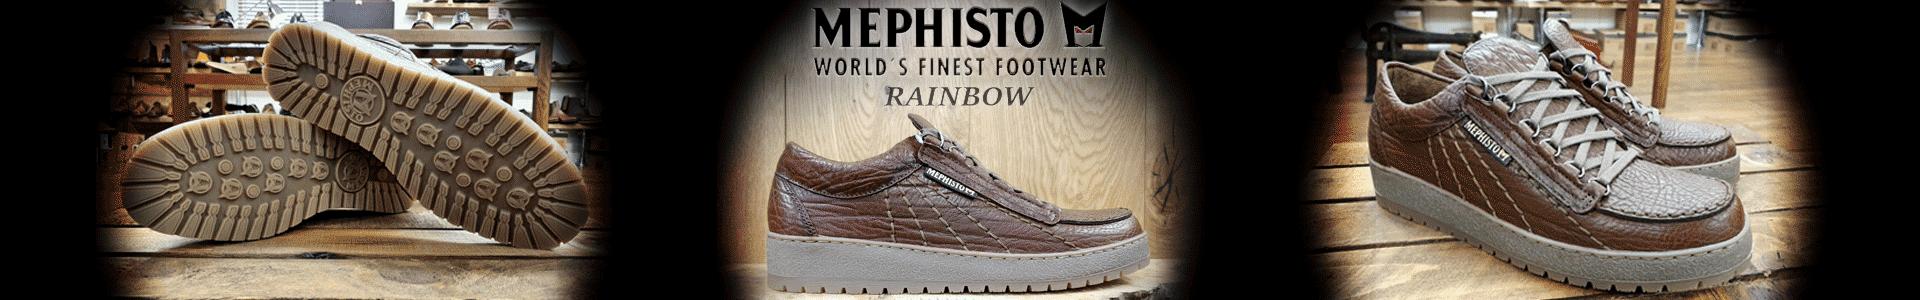 Shop Mephisto Rainbow